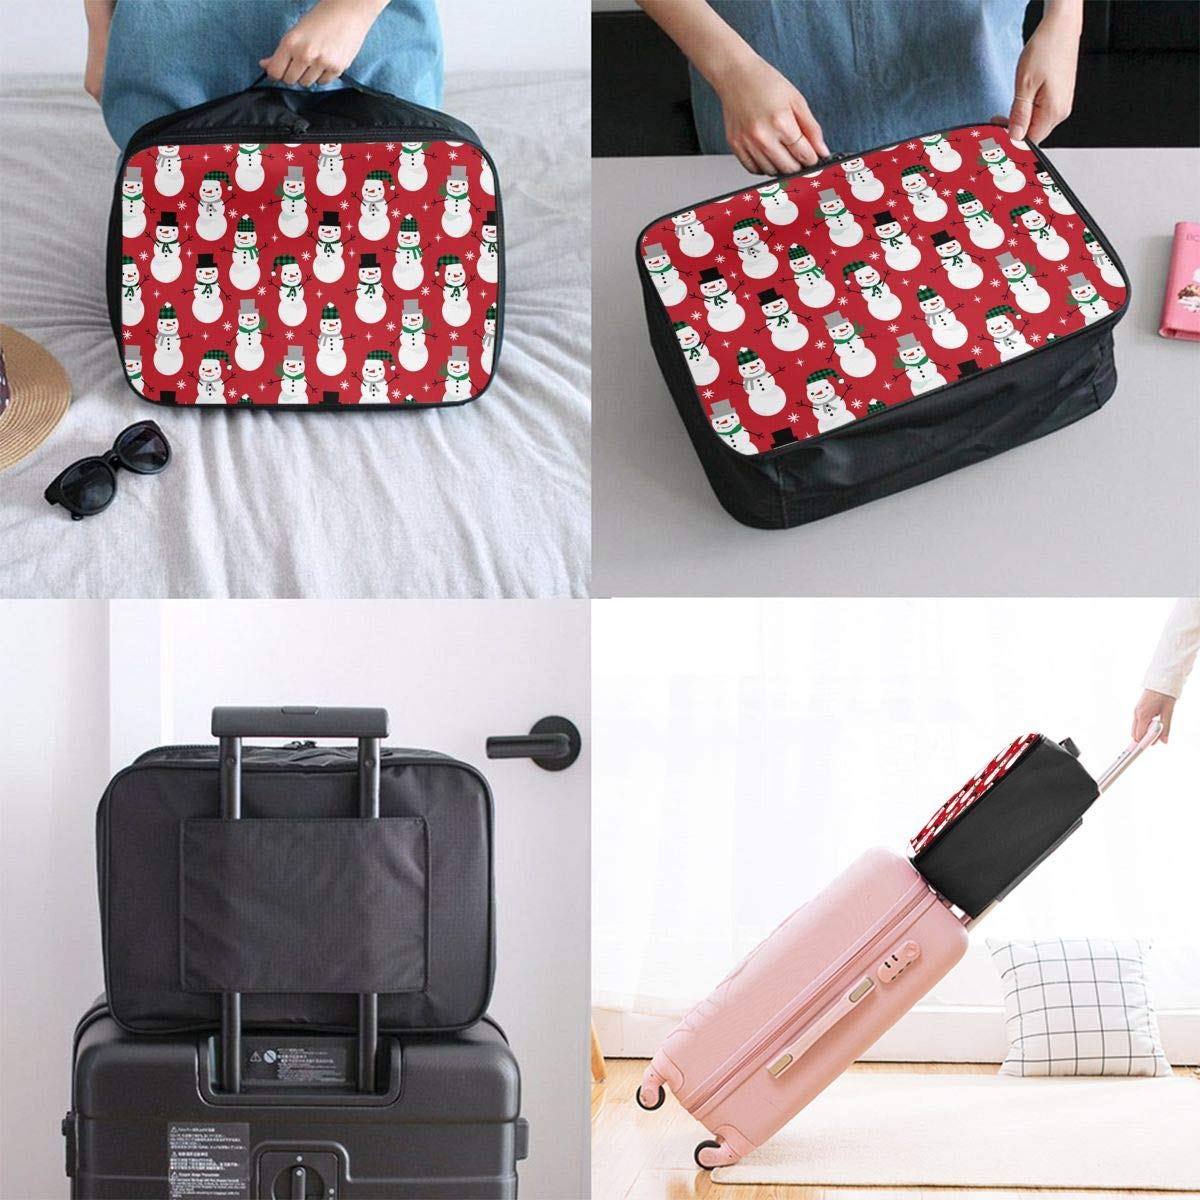 Holiday Overnight Carry On Bag Travel Duffle Bag In Trolley Handle Lightweight Weekender Bag Nylon Luggage Duffel Bag Gym Christmas Snowman Luggage Bag Sports